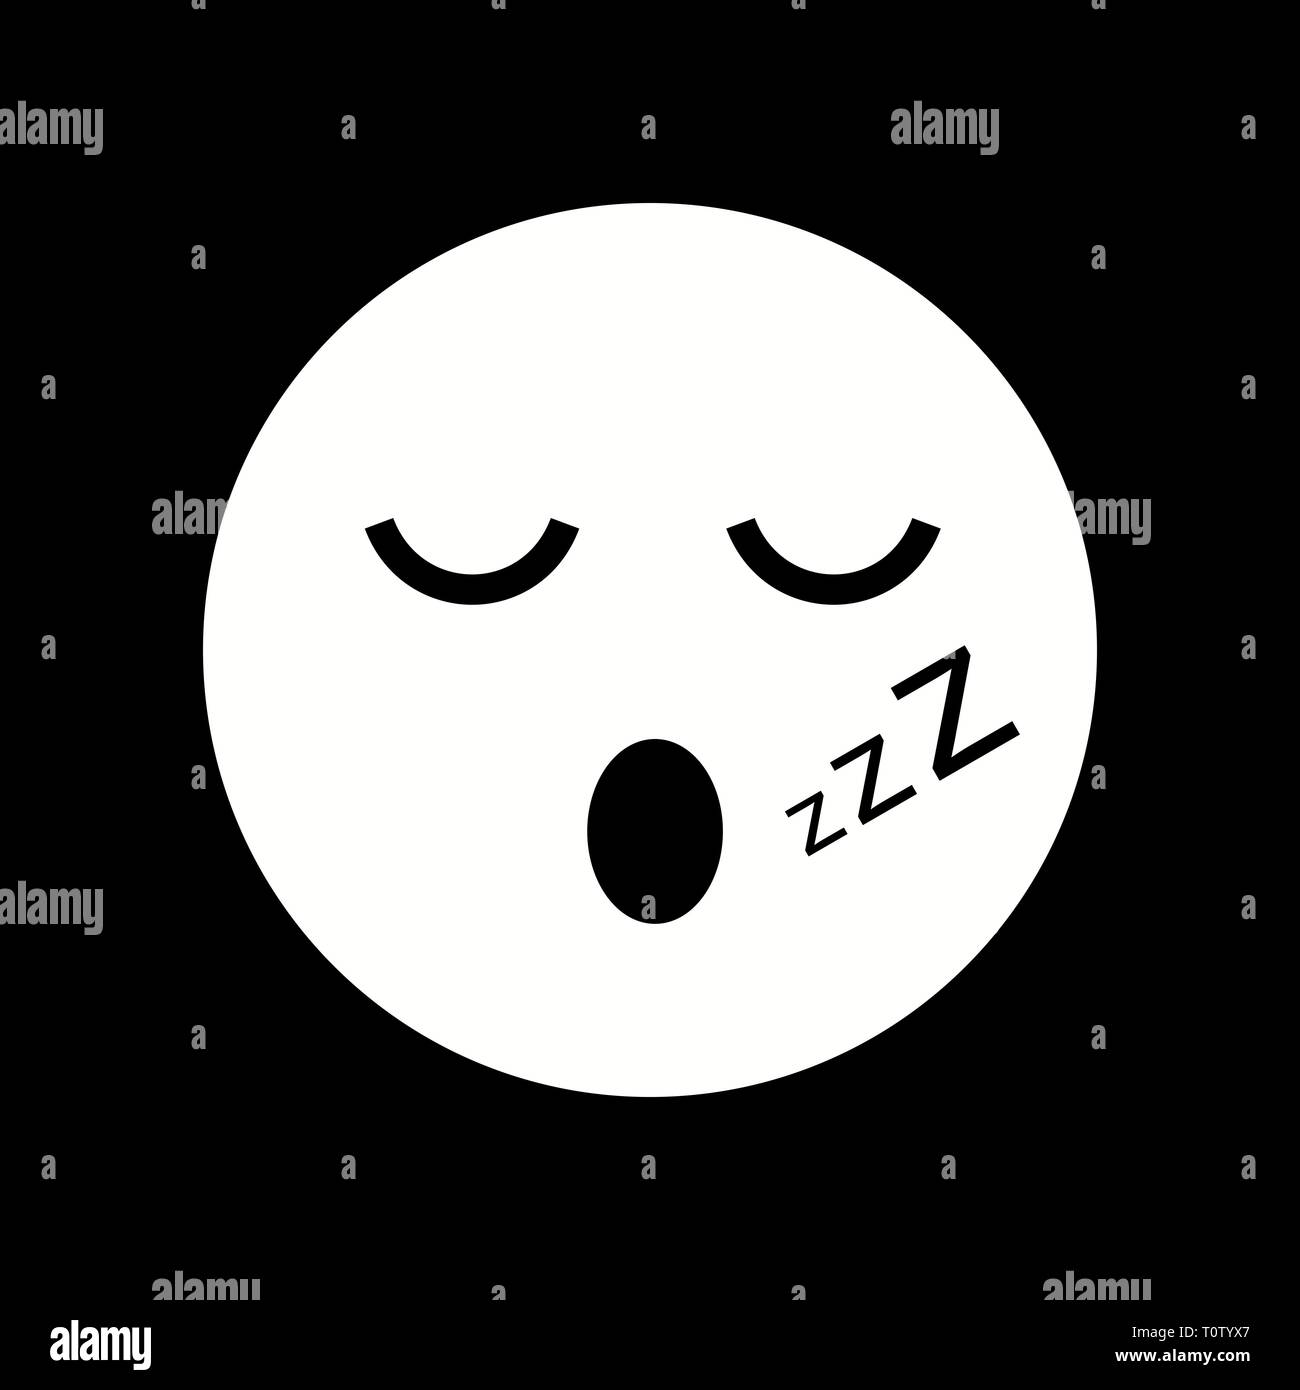 Illustration Sleep Emoji Icon Stock Photo: 241493903 - Alamy